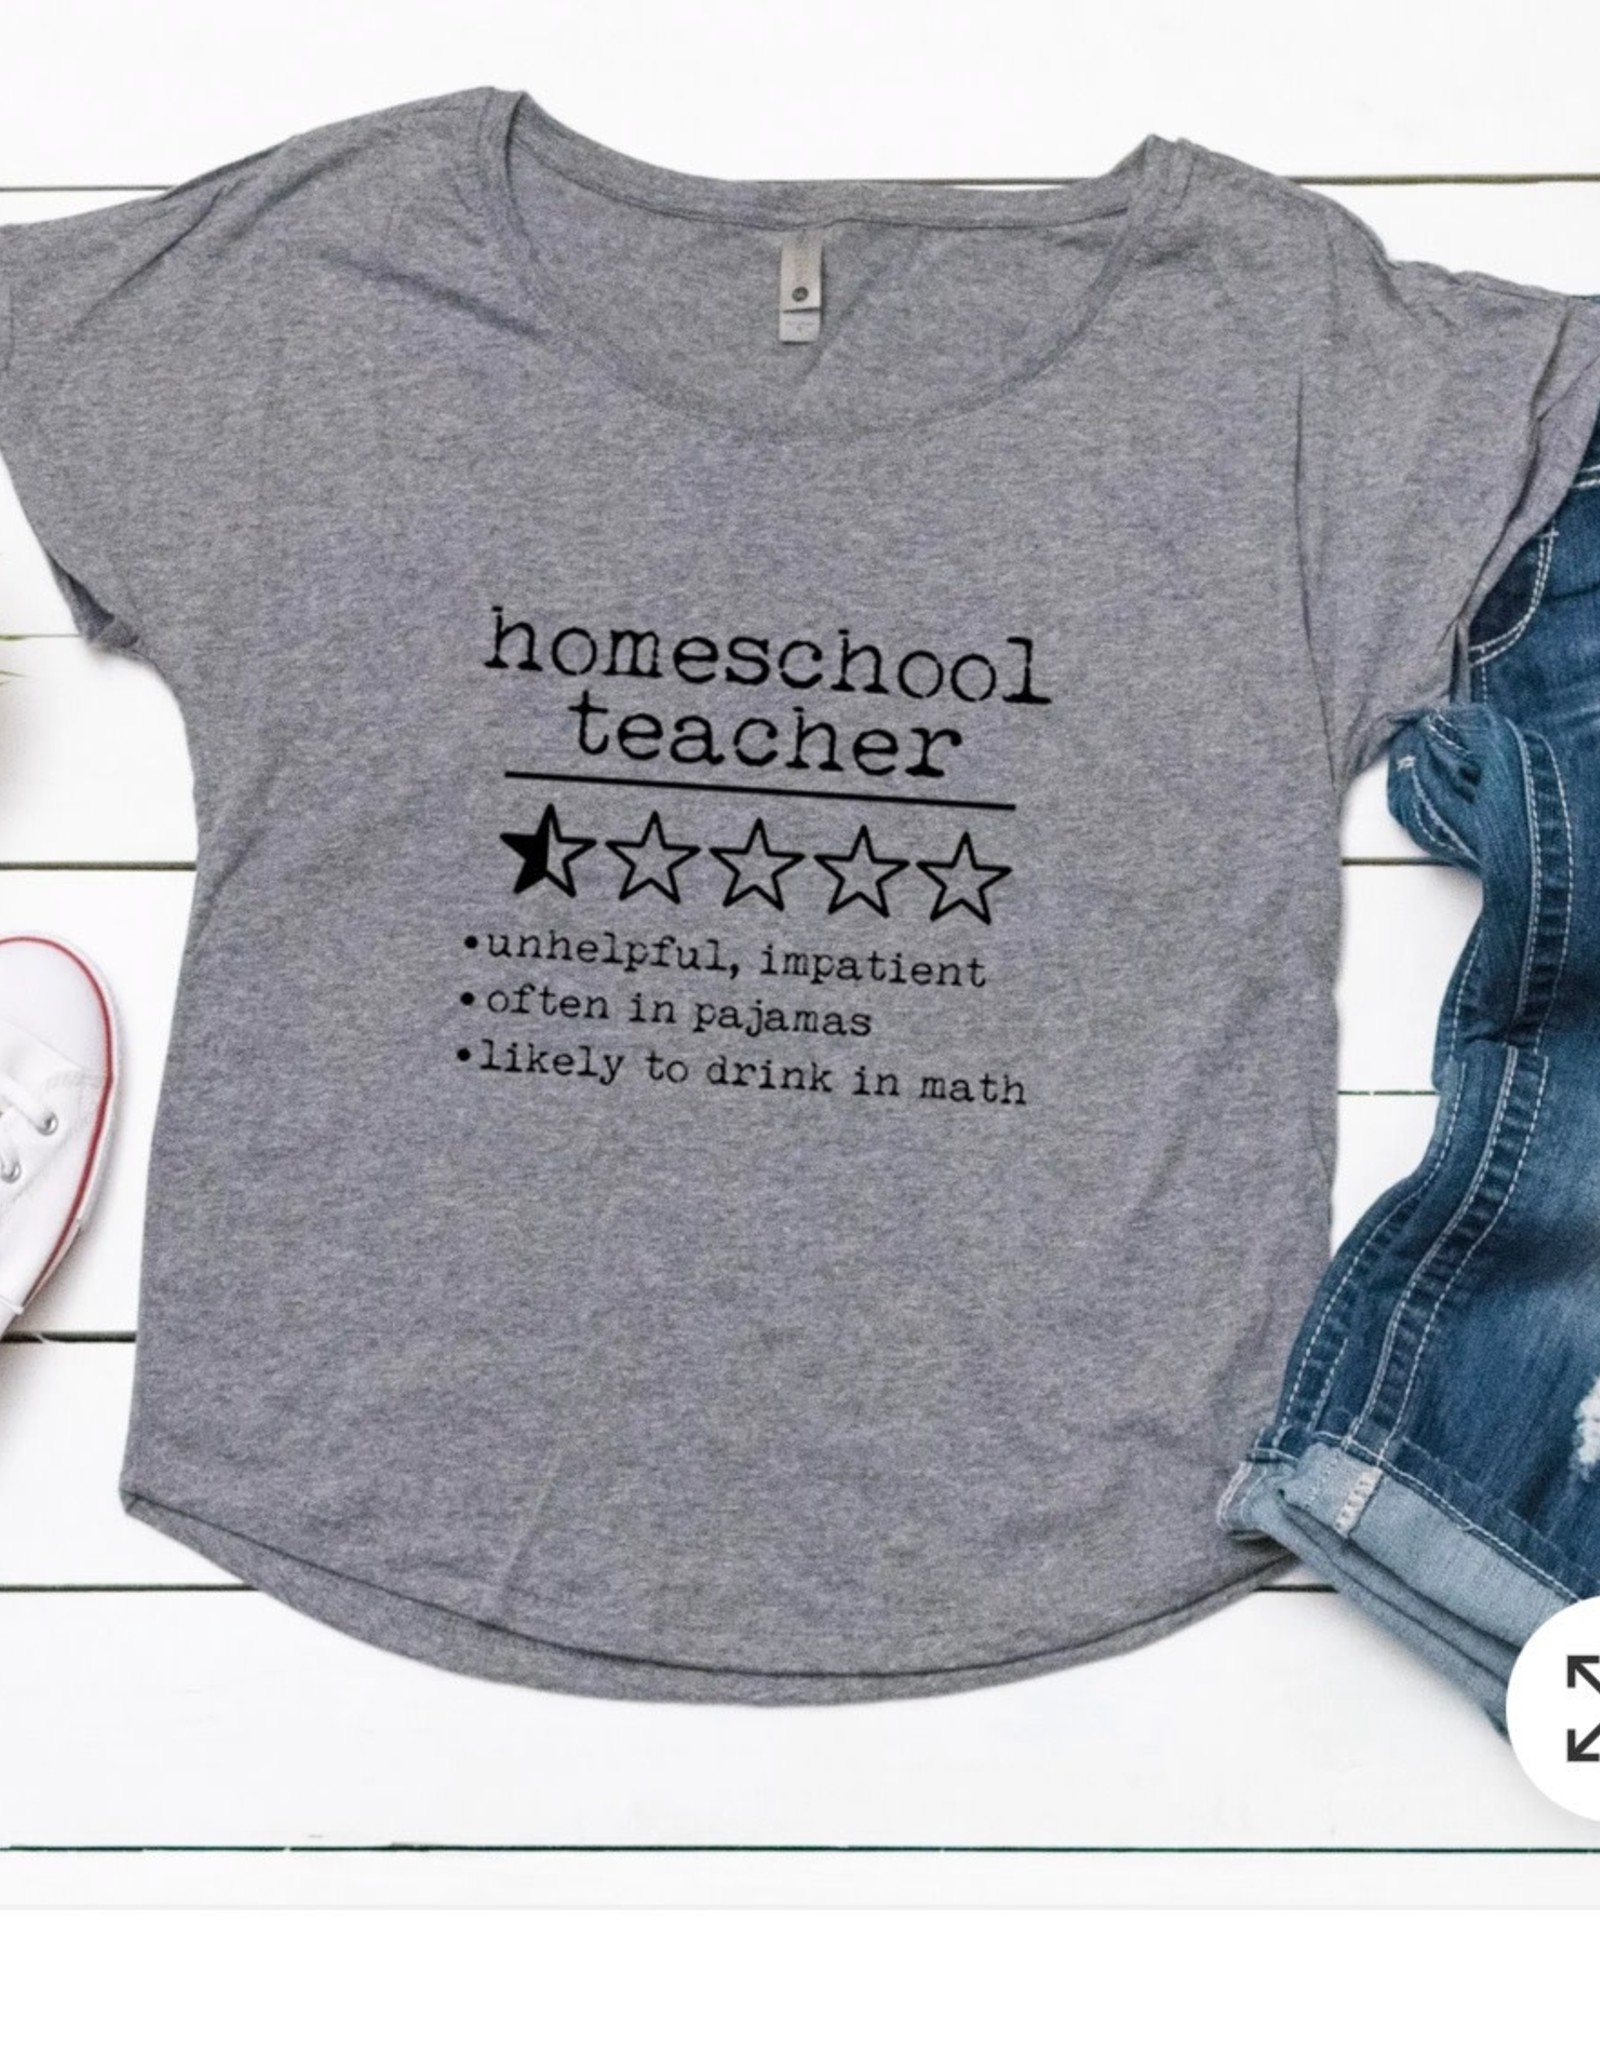 Moonlight Makers Homeschool Teacher DolmanTee